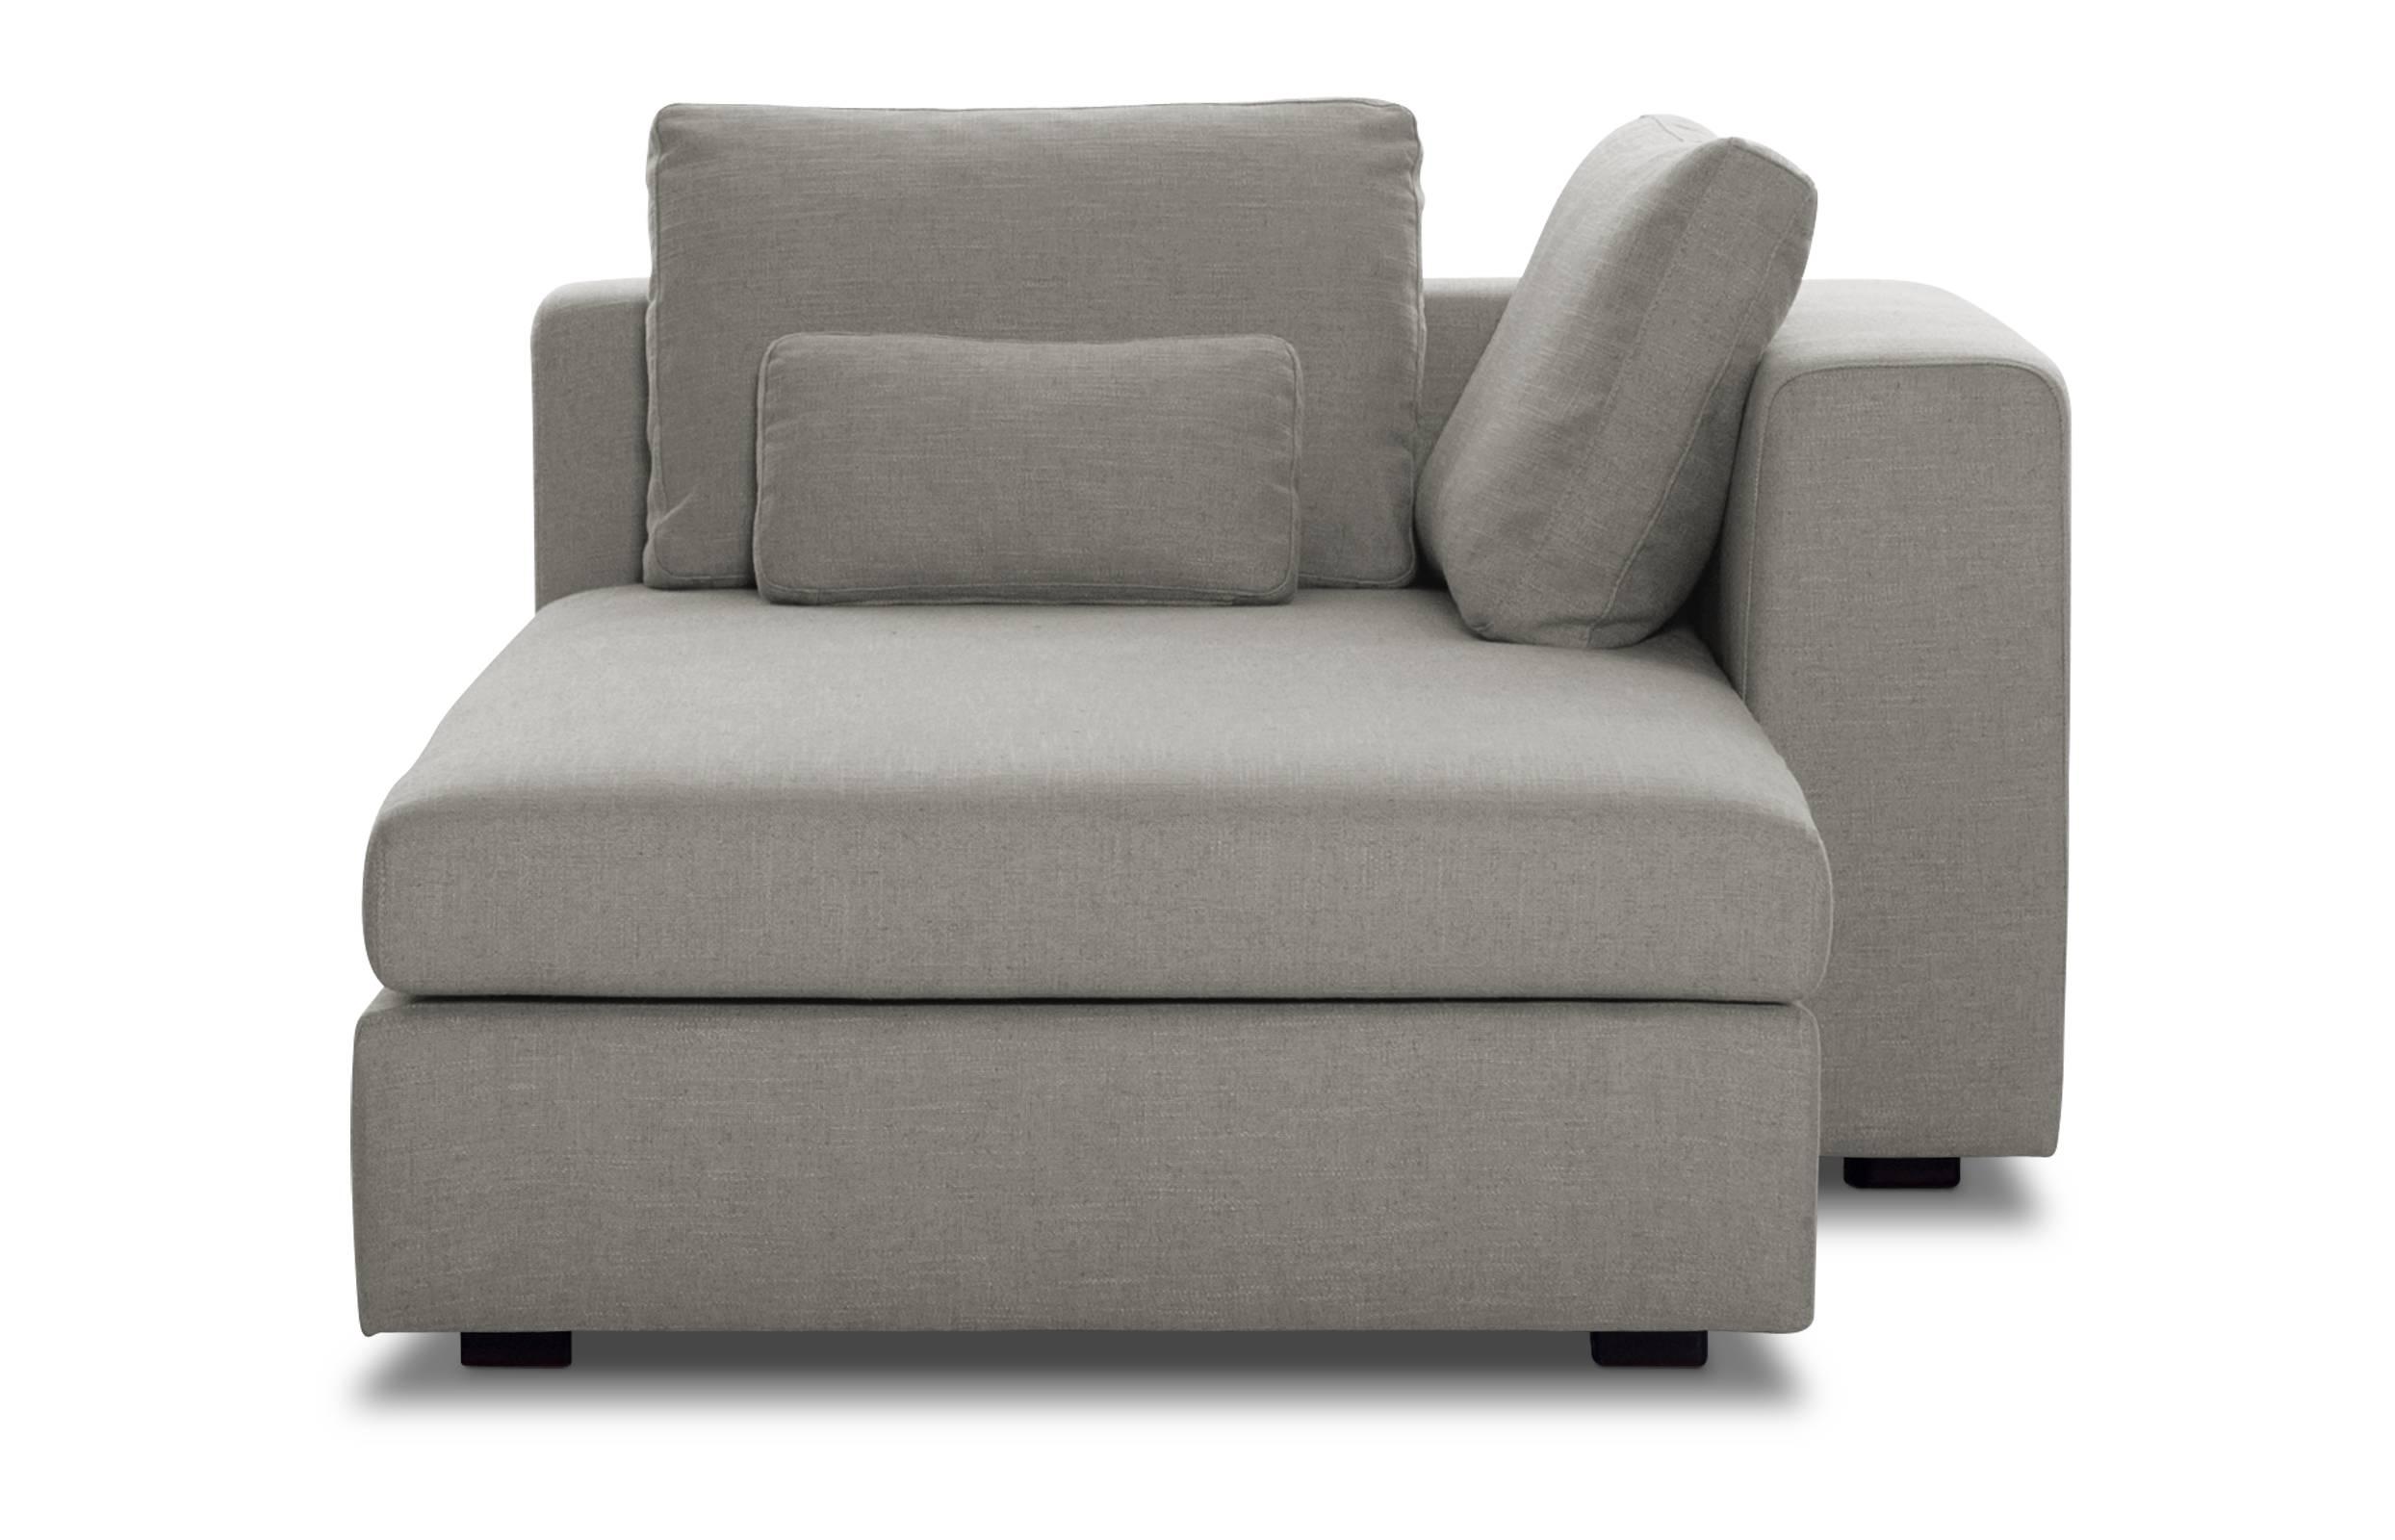 Full Size of Natura Sofa Newport Kansas Couch Brooklyn Gebraucht Denver Love Home Kaufen Pasadena Livingston Wk 3 Sitzer Esstisch Ebay Grau Leder Mit Bettfunktion Sofa Natura Sofa